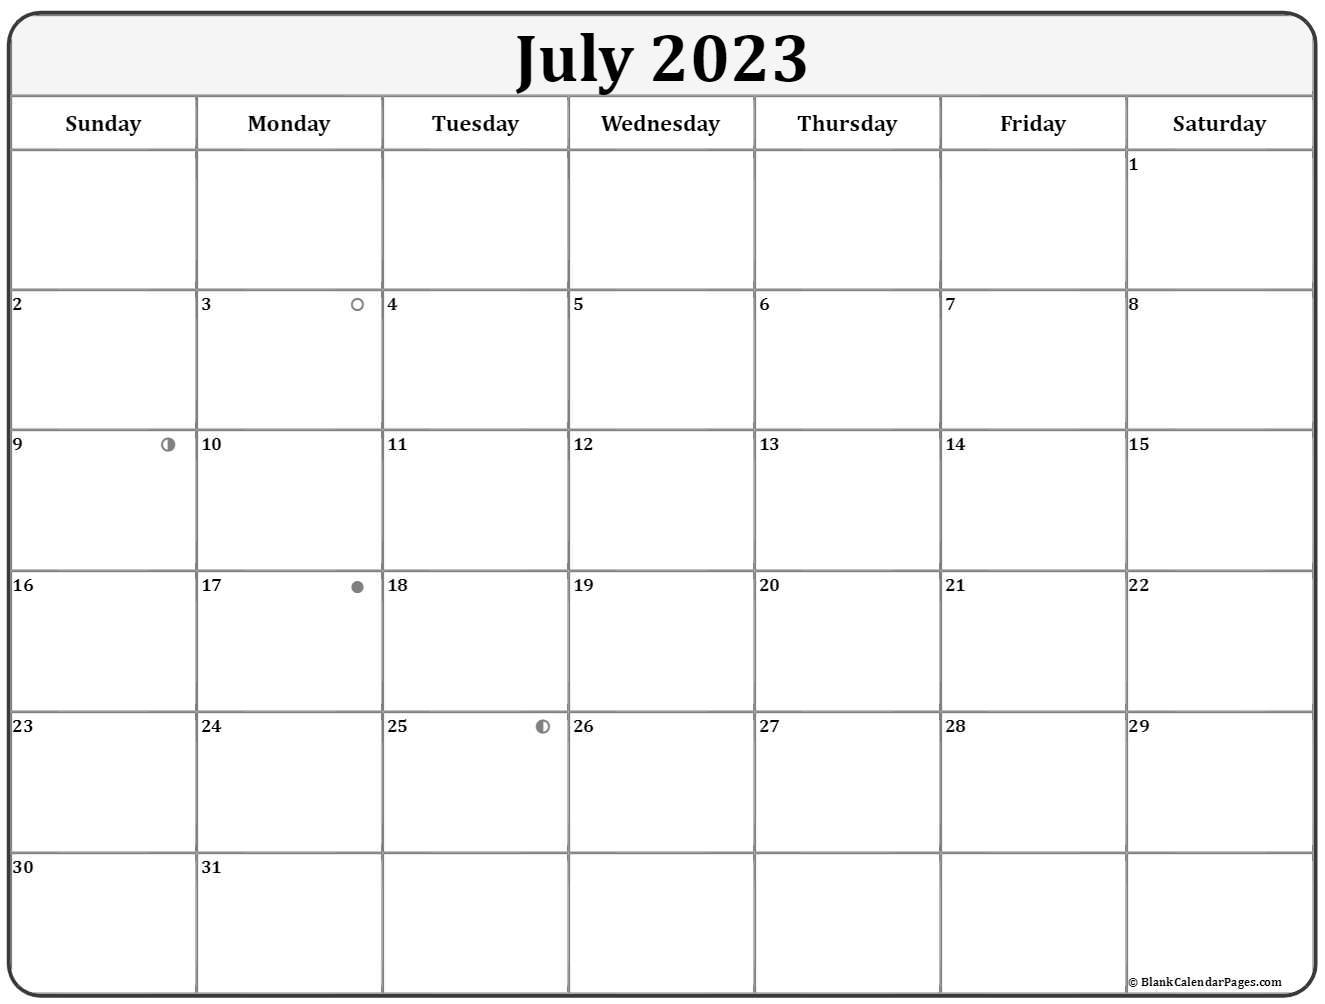 July Lunar Calendar